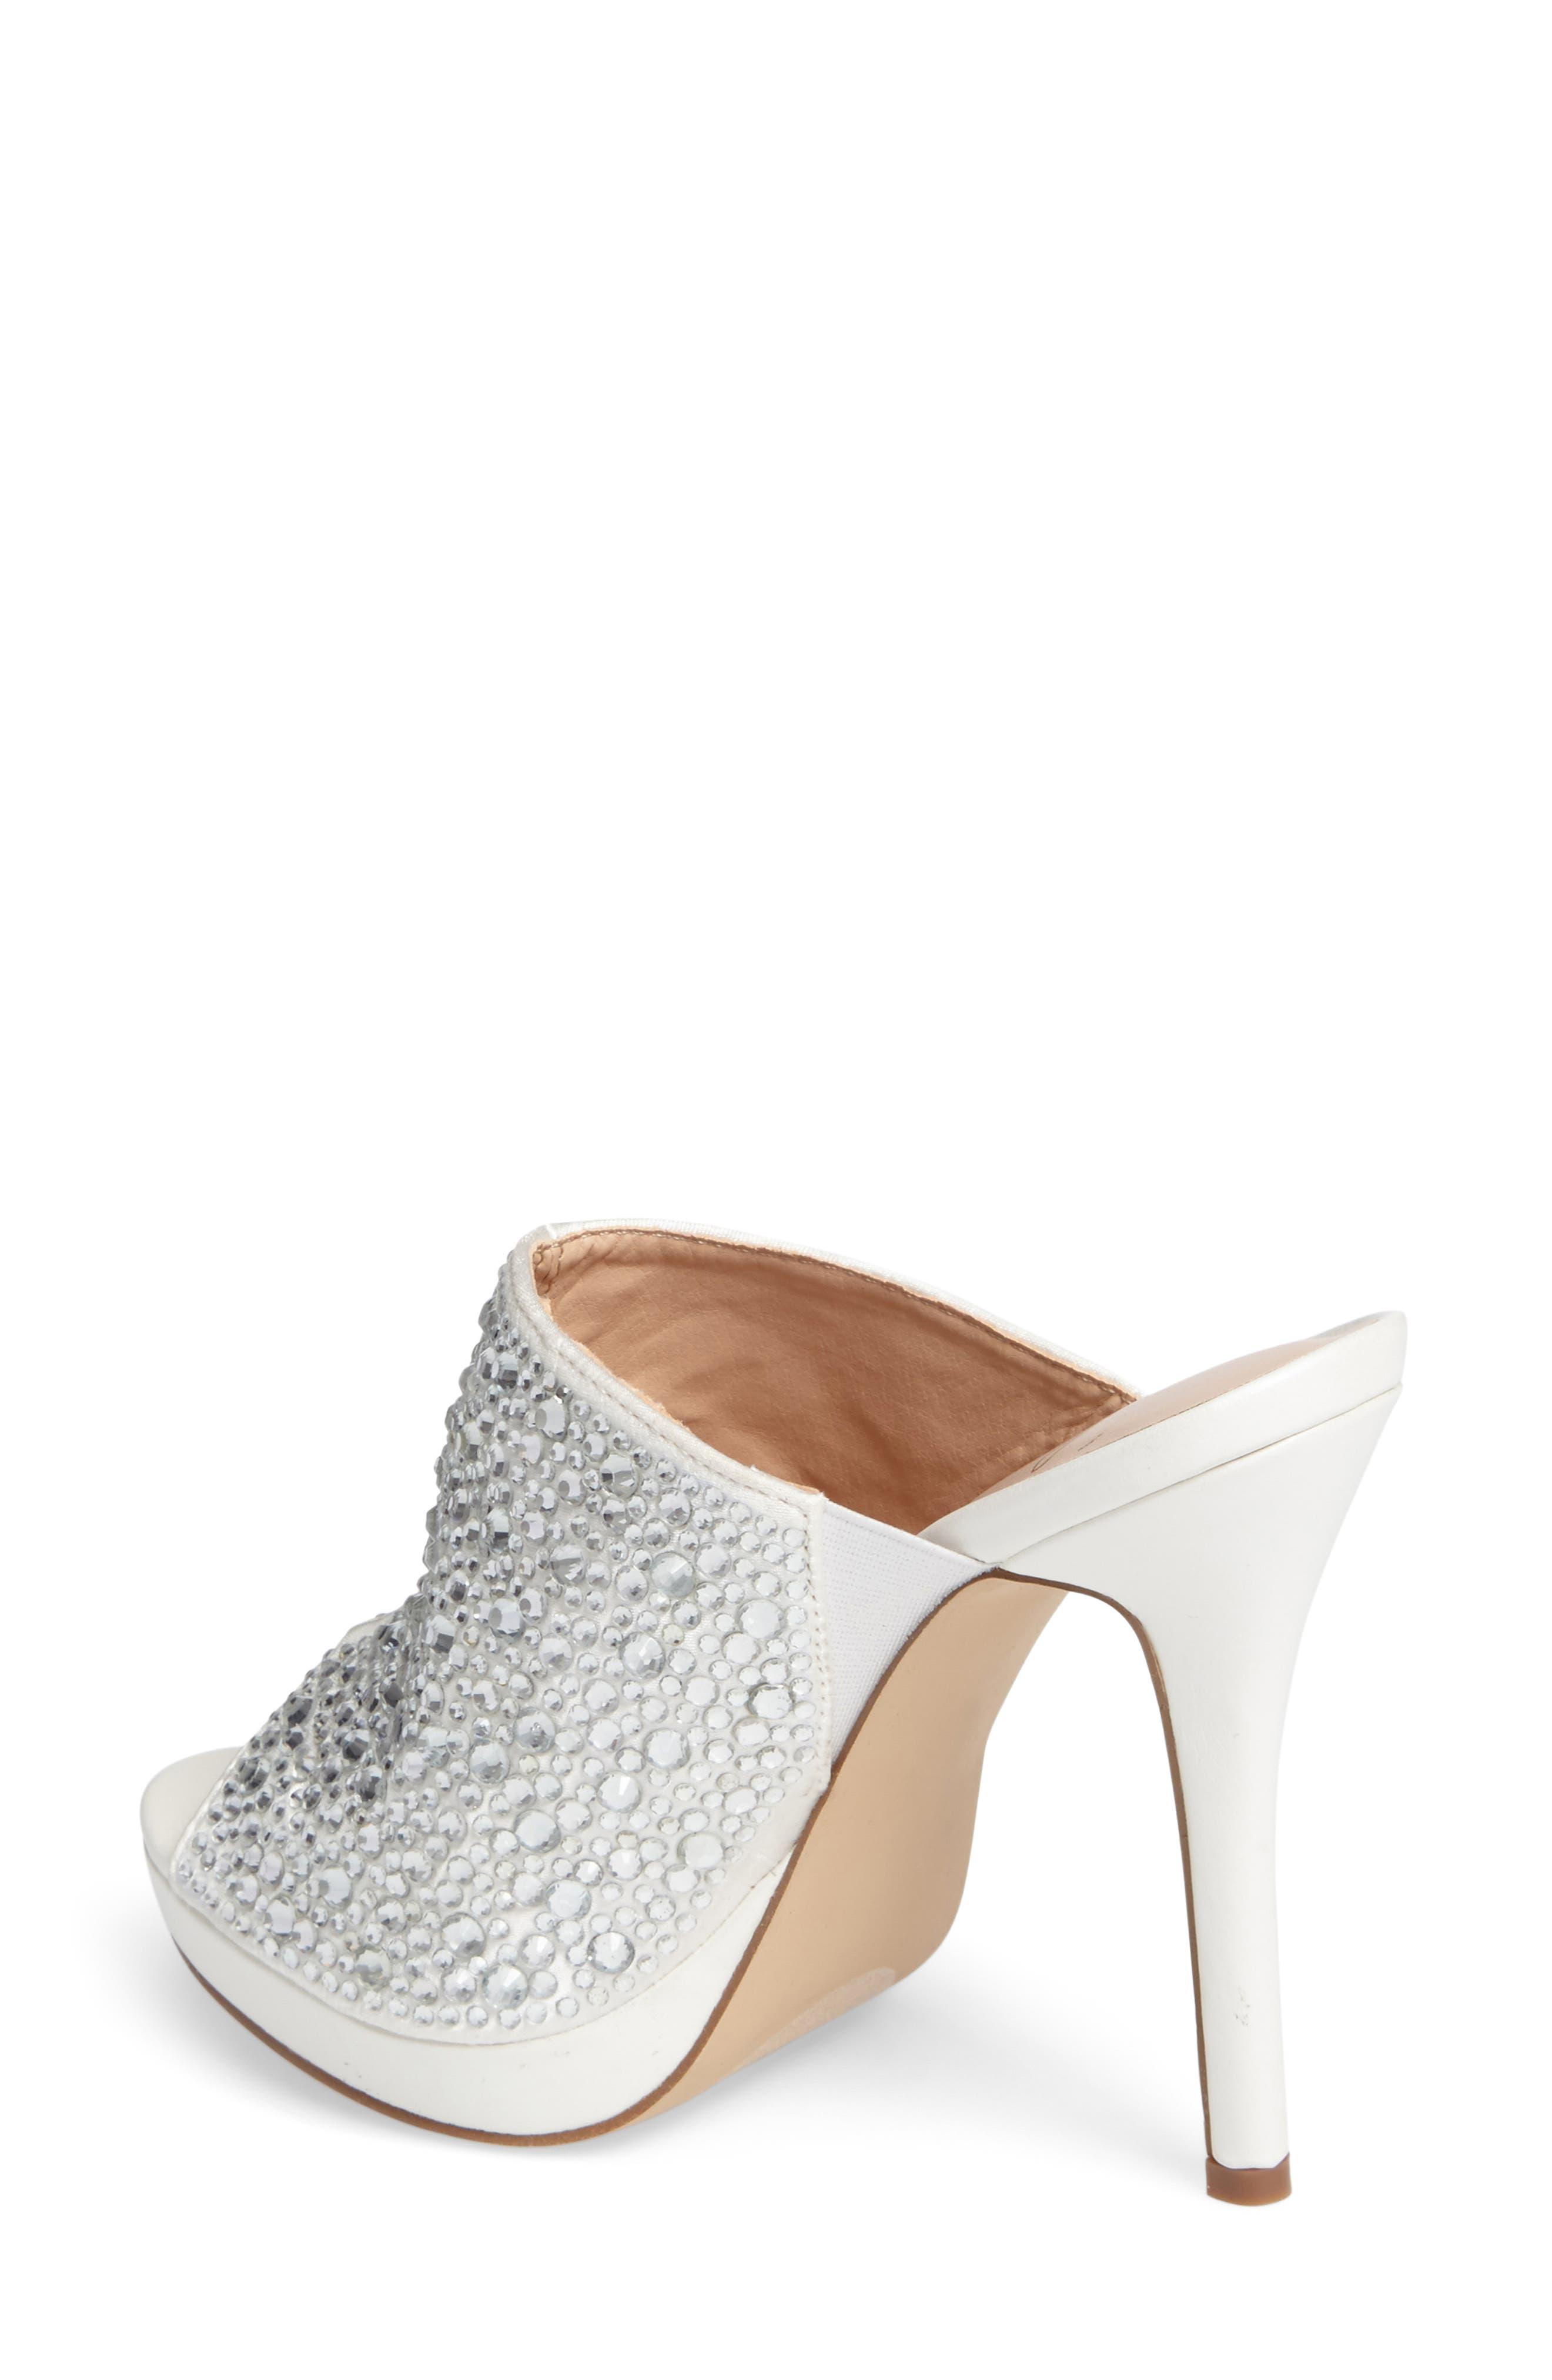 Alternate Image 2  - Lauren Lorraine Mimi Embellished Slide Sandal (Women)